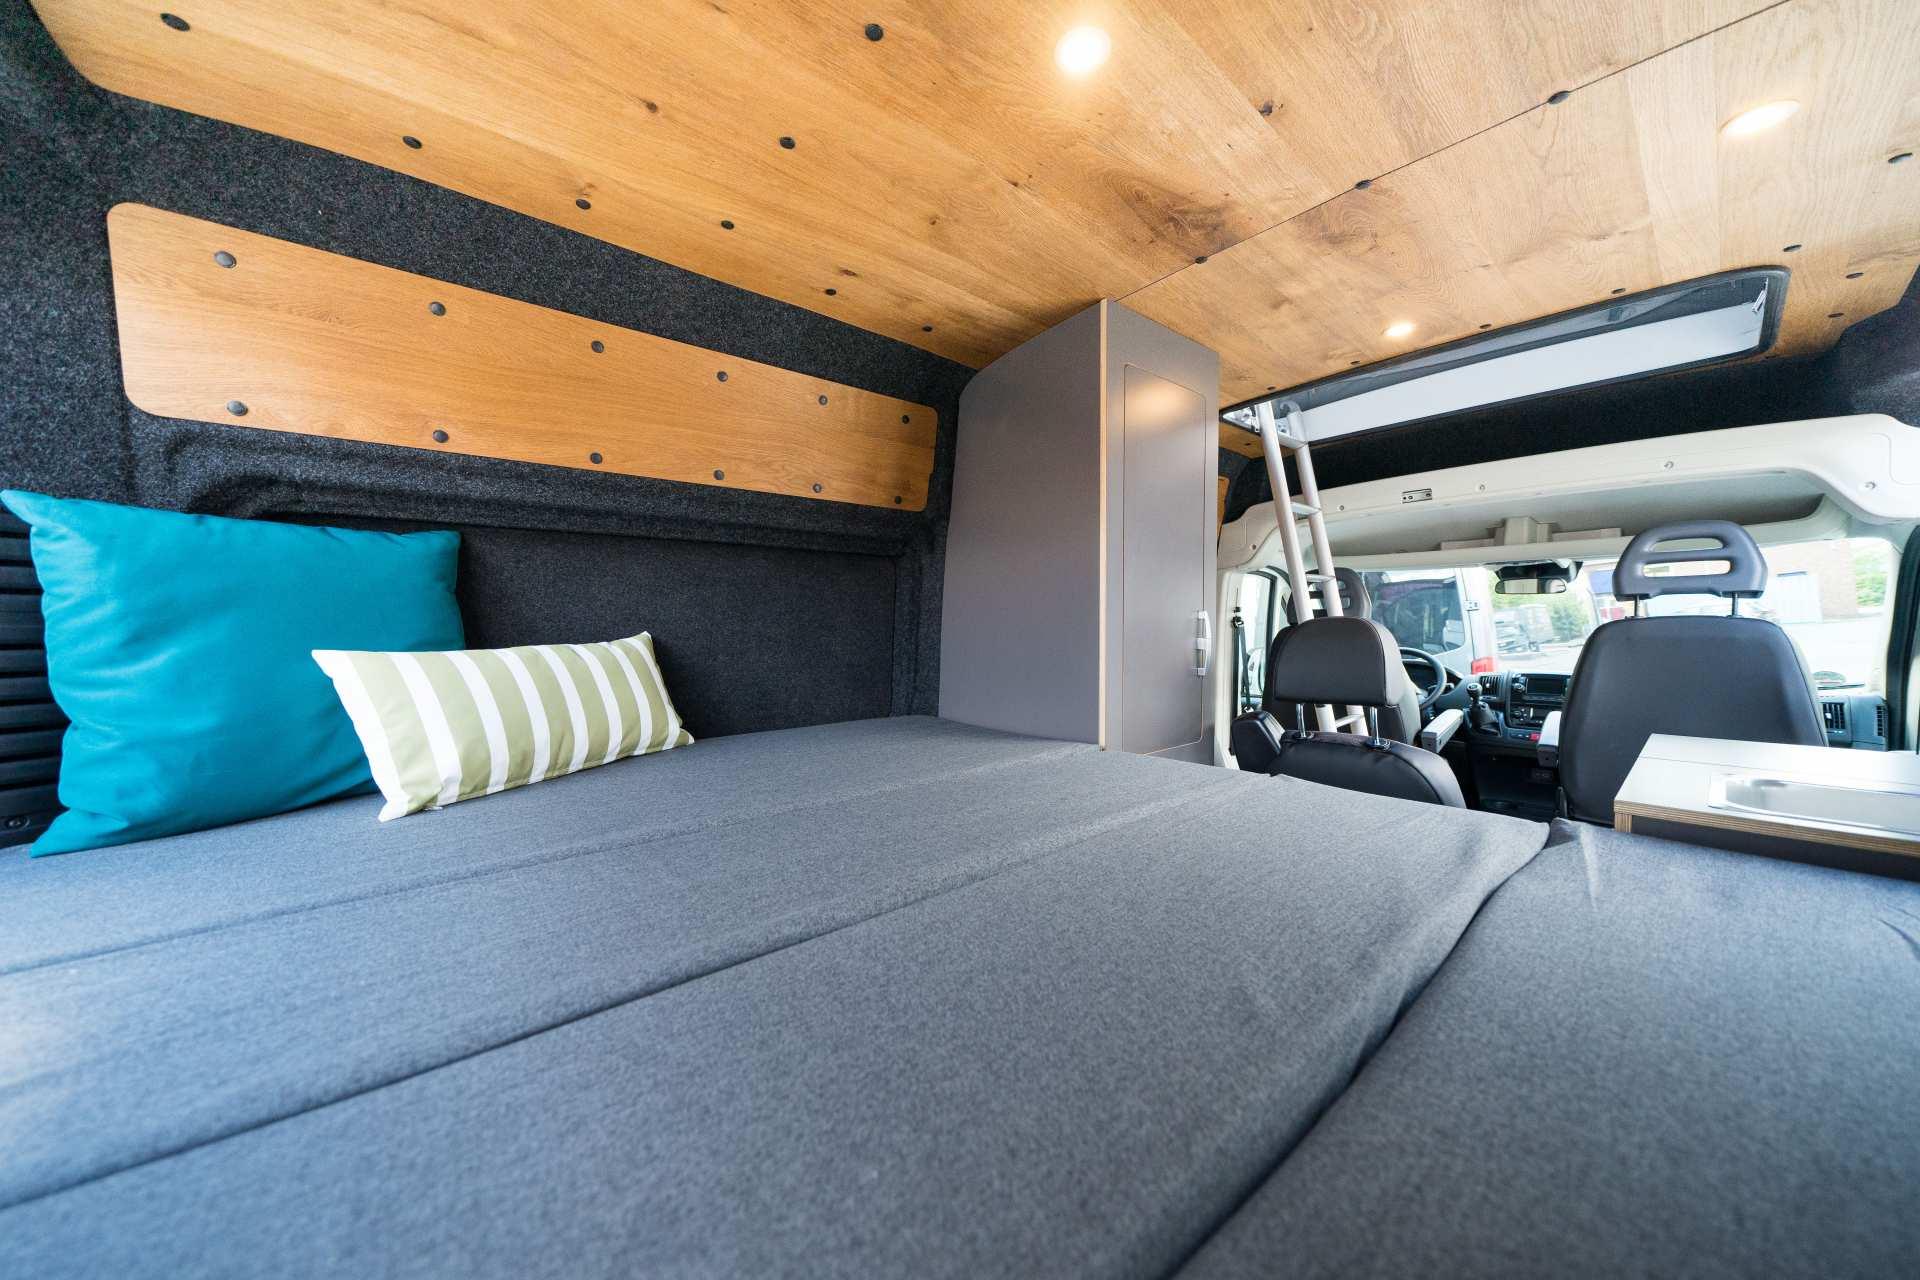 Individualausbau: Zwei-Raumwohnung Peugeot Boxer L2 H2 - 20